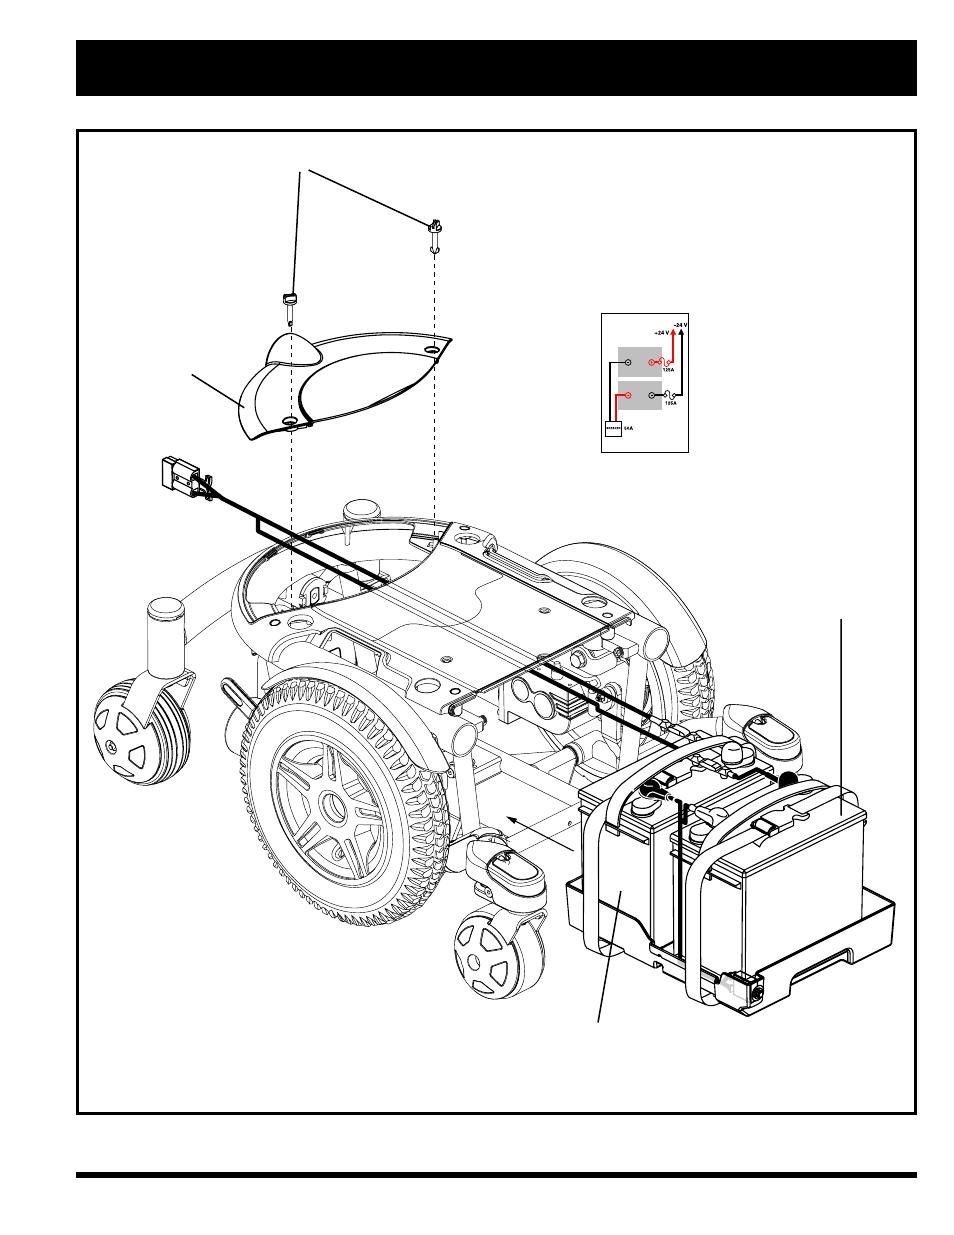 jazzy 600 wiring diagram wiring diagramjeep cherokee power steeringjazzy 600 wiring diagram 20